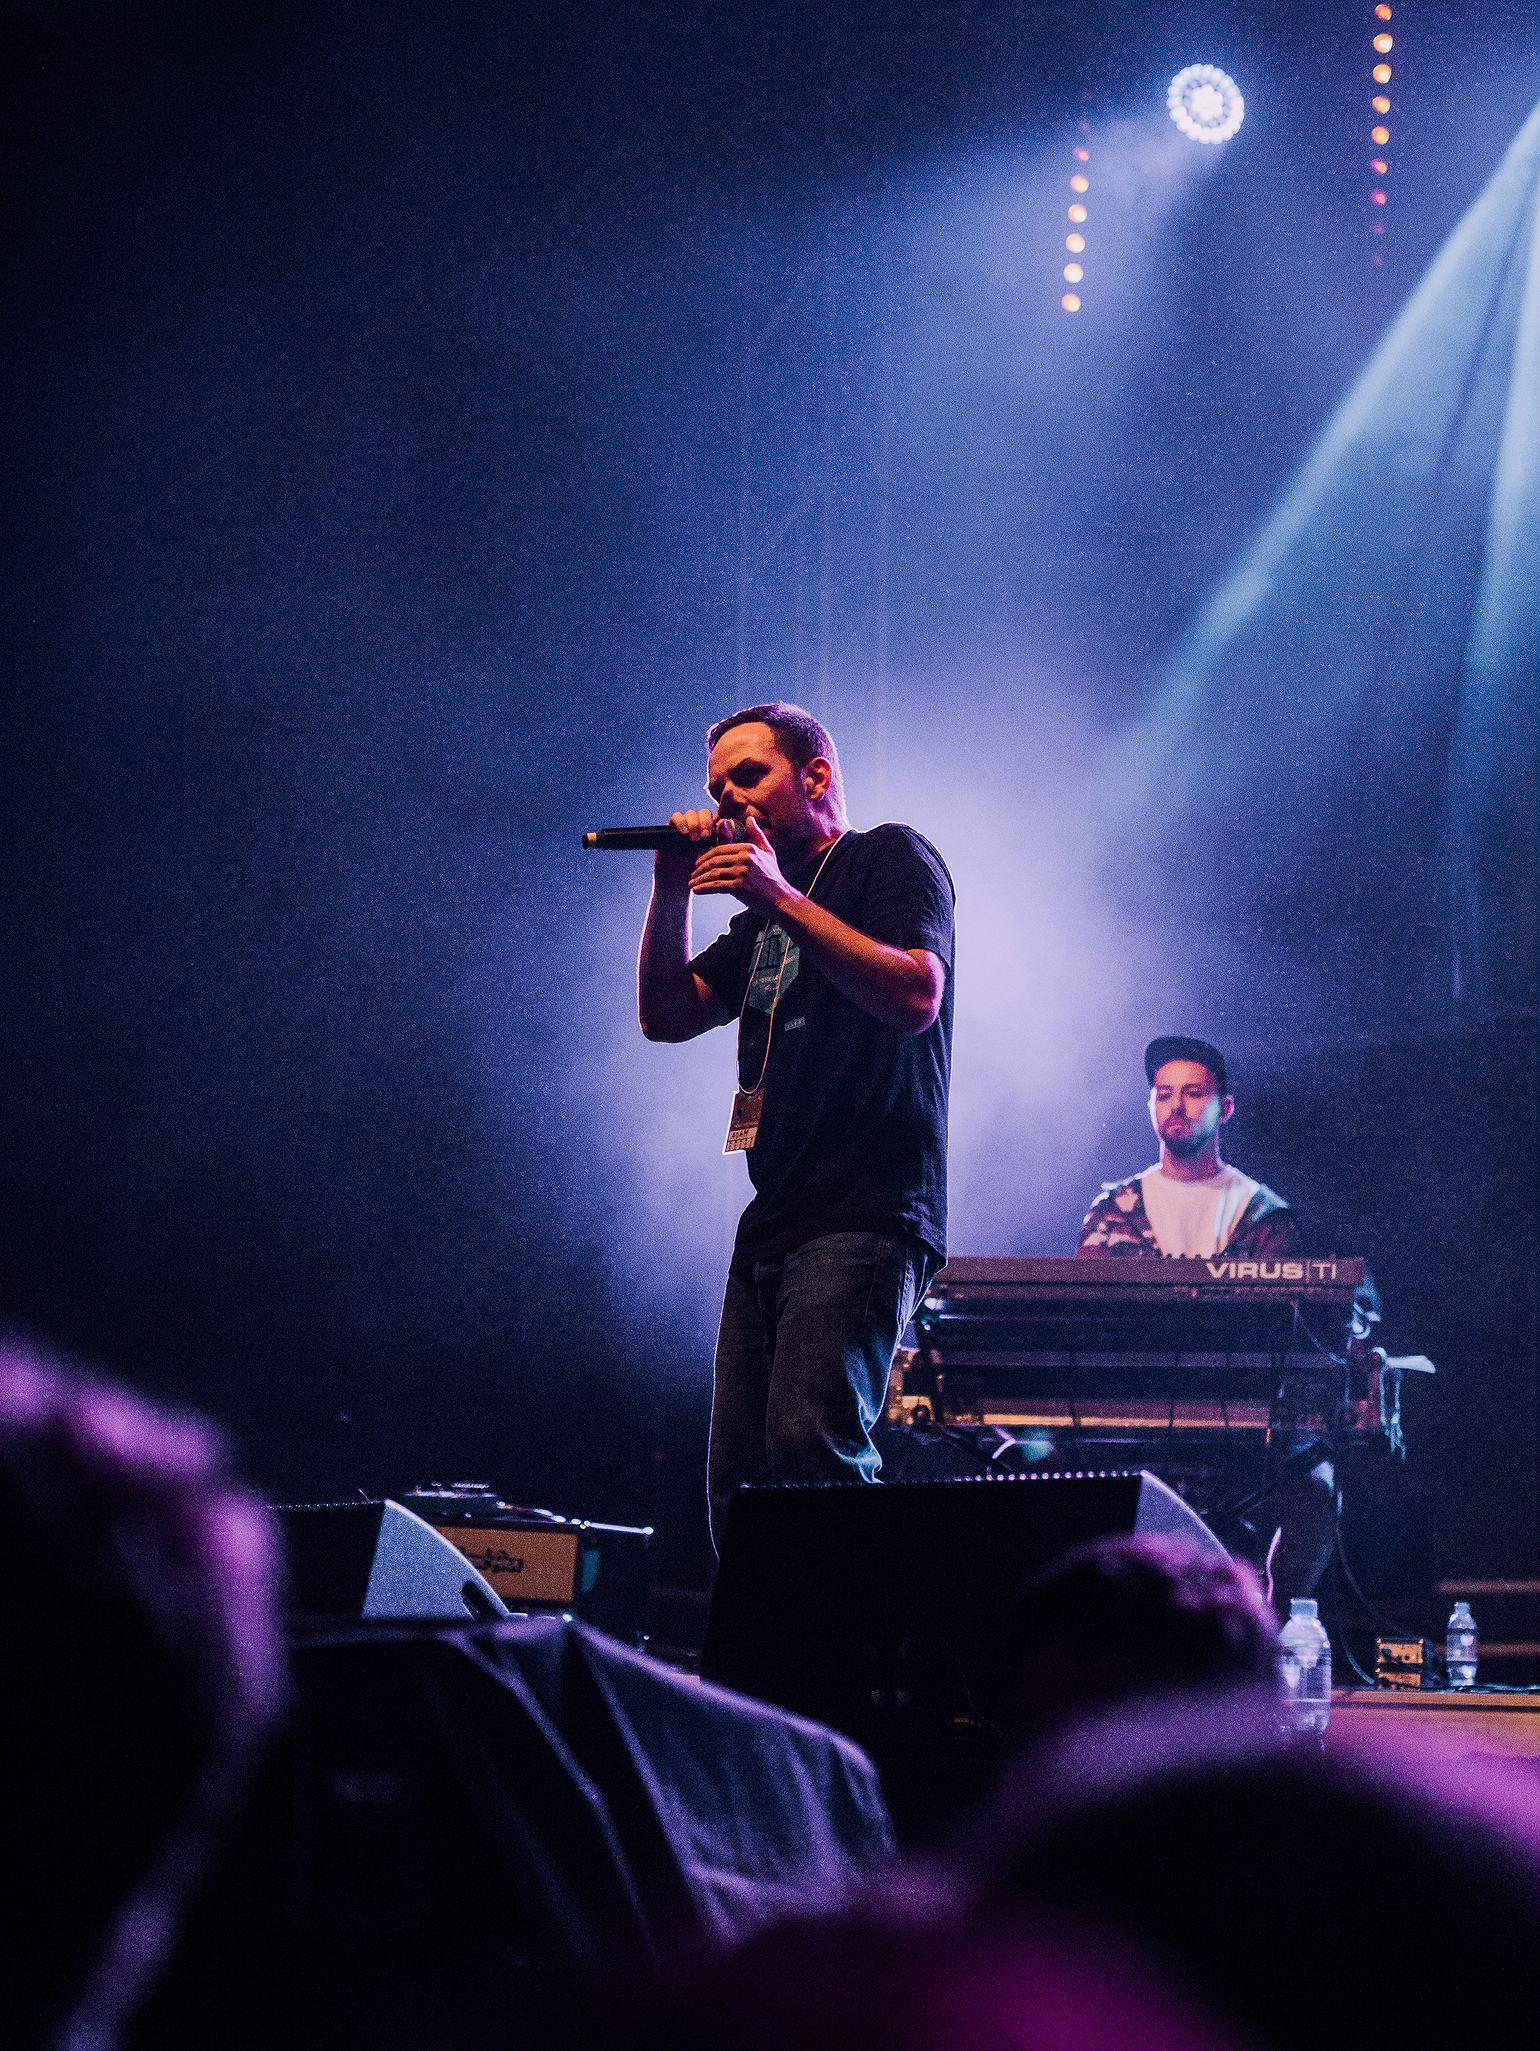 Dzień 1375 - koncert Łony, lipiec 2018